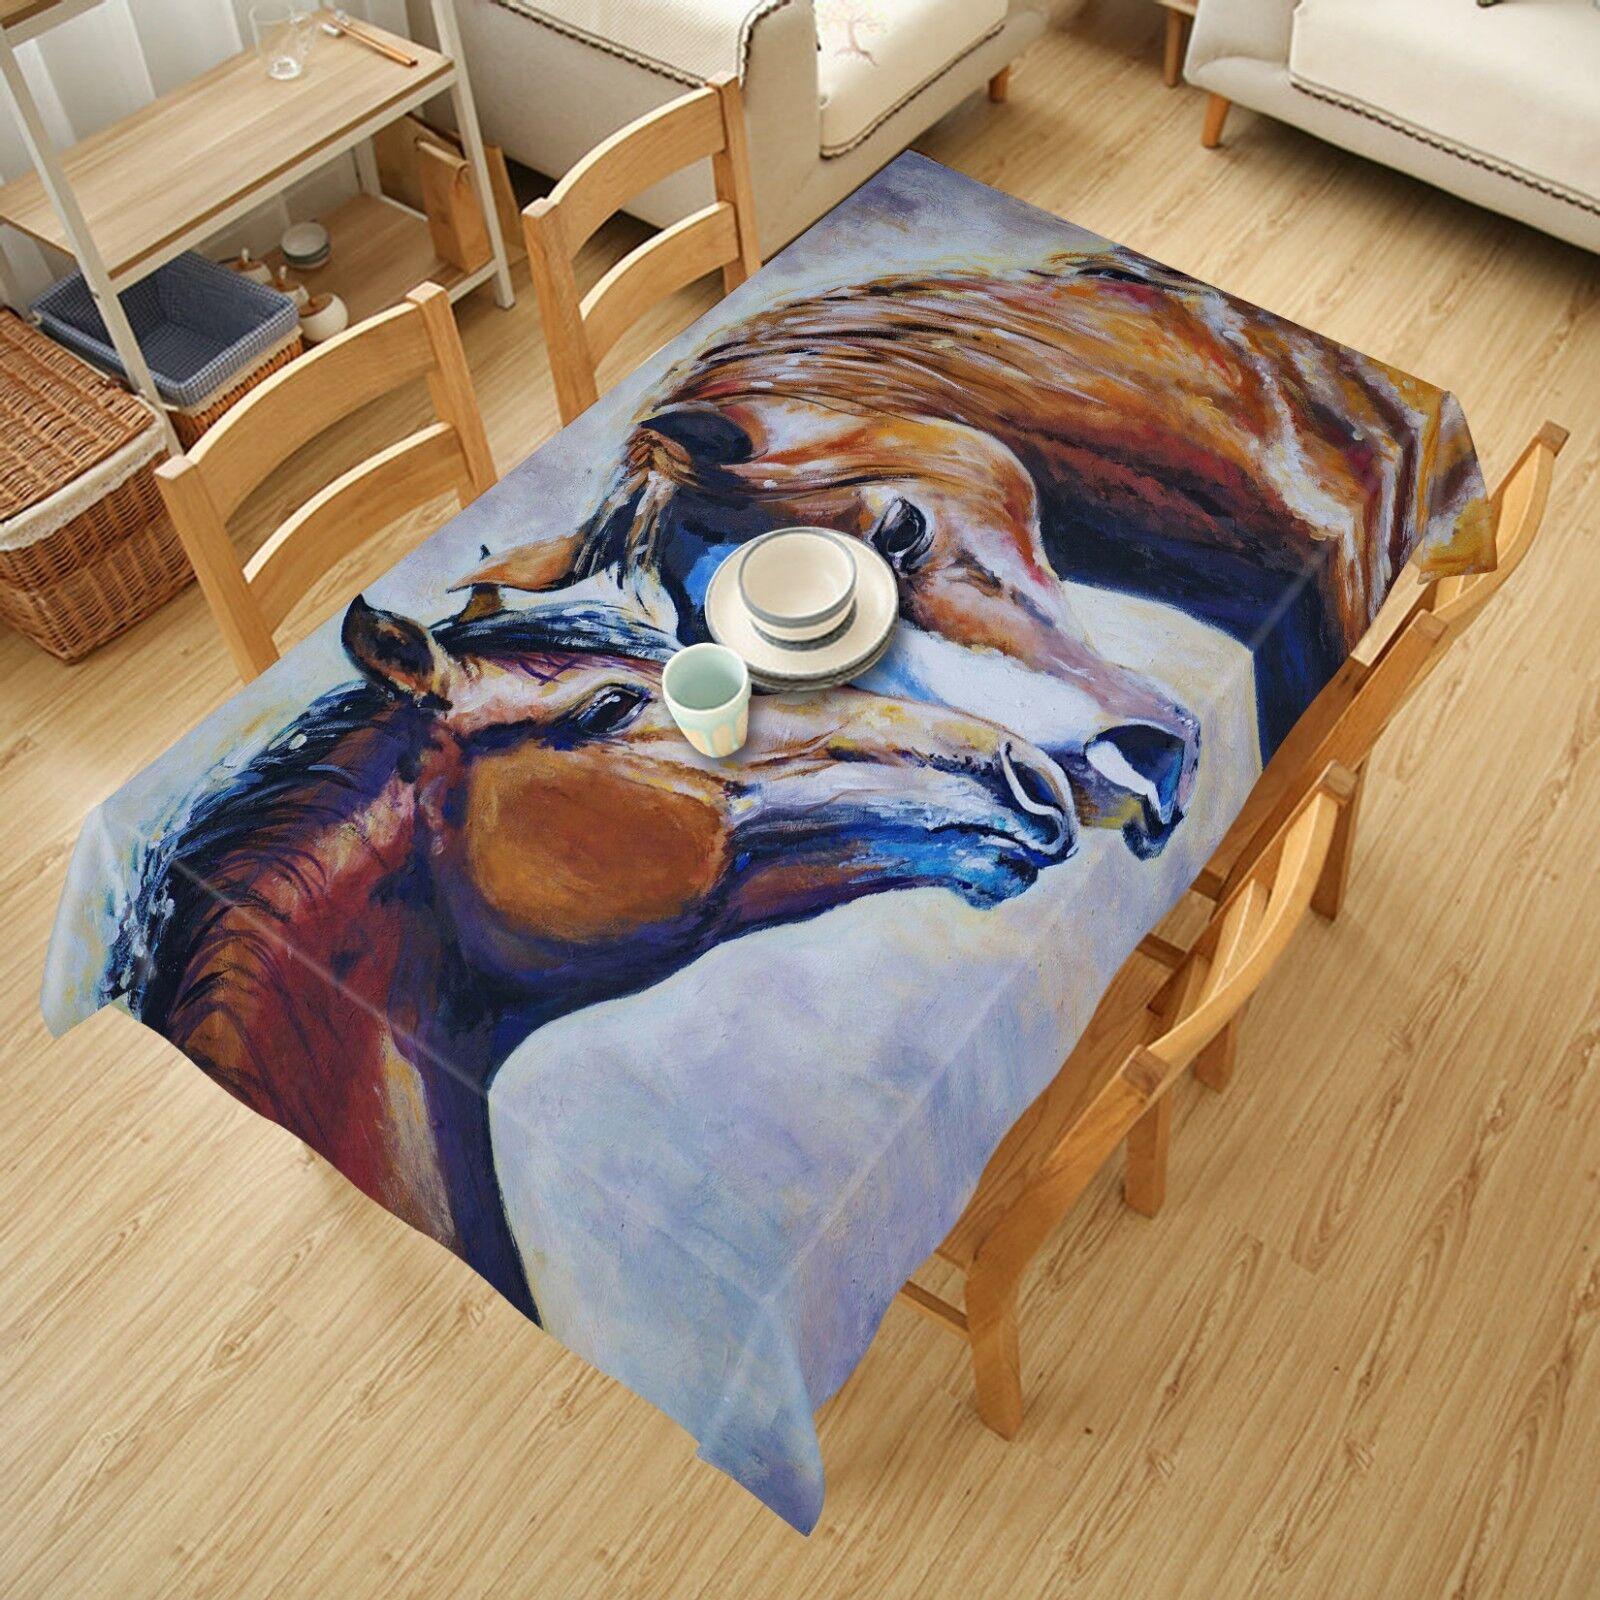 3D Horses Face 057 Tablecloth Table Cover Cloth Birthday Party Event AJ Lemon